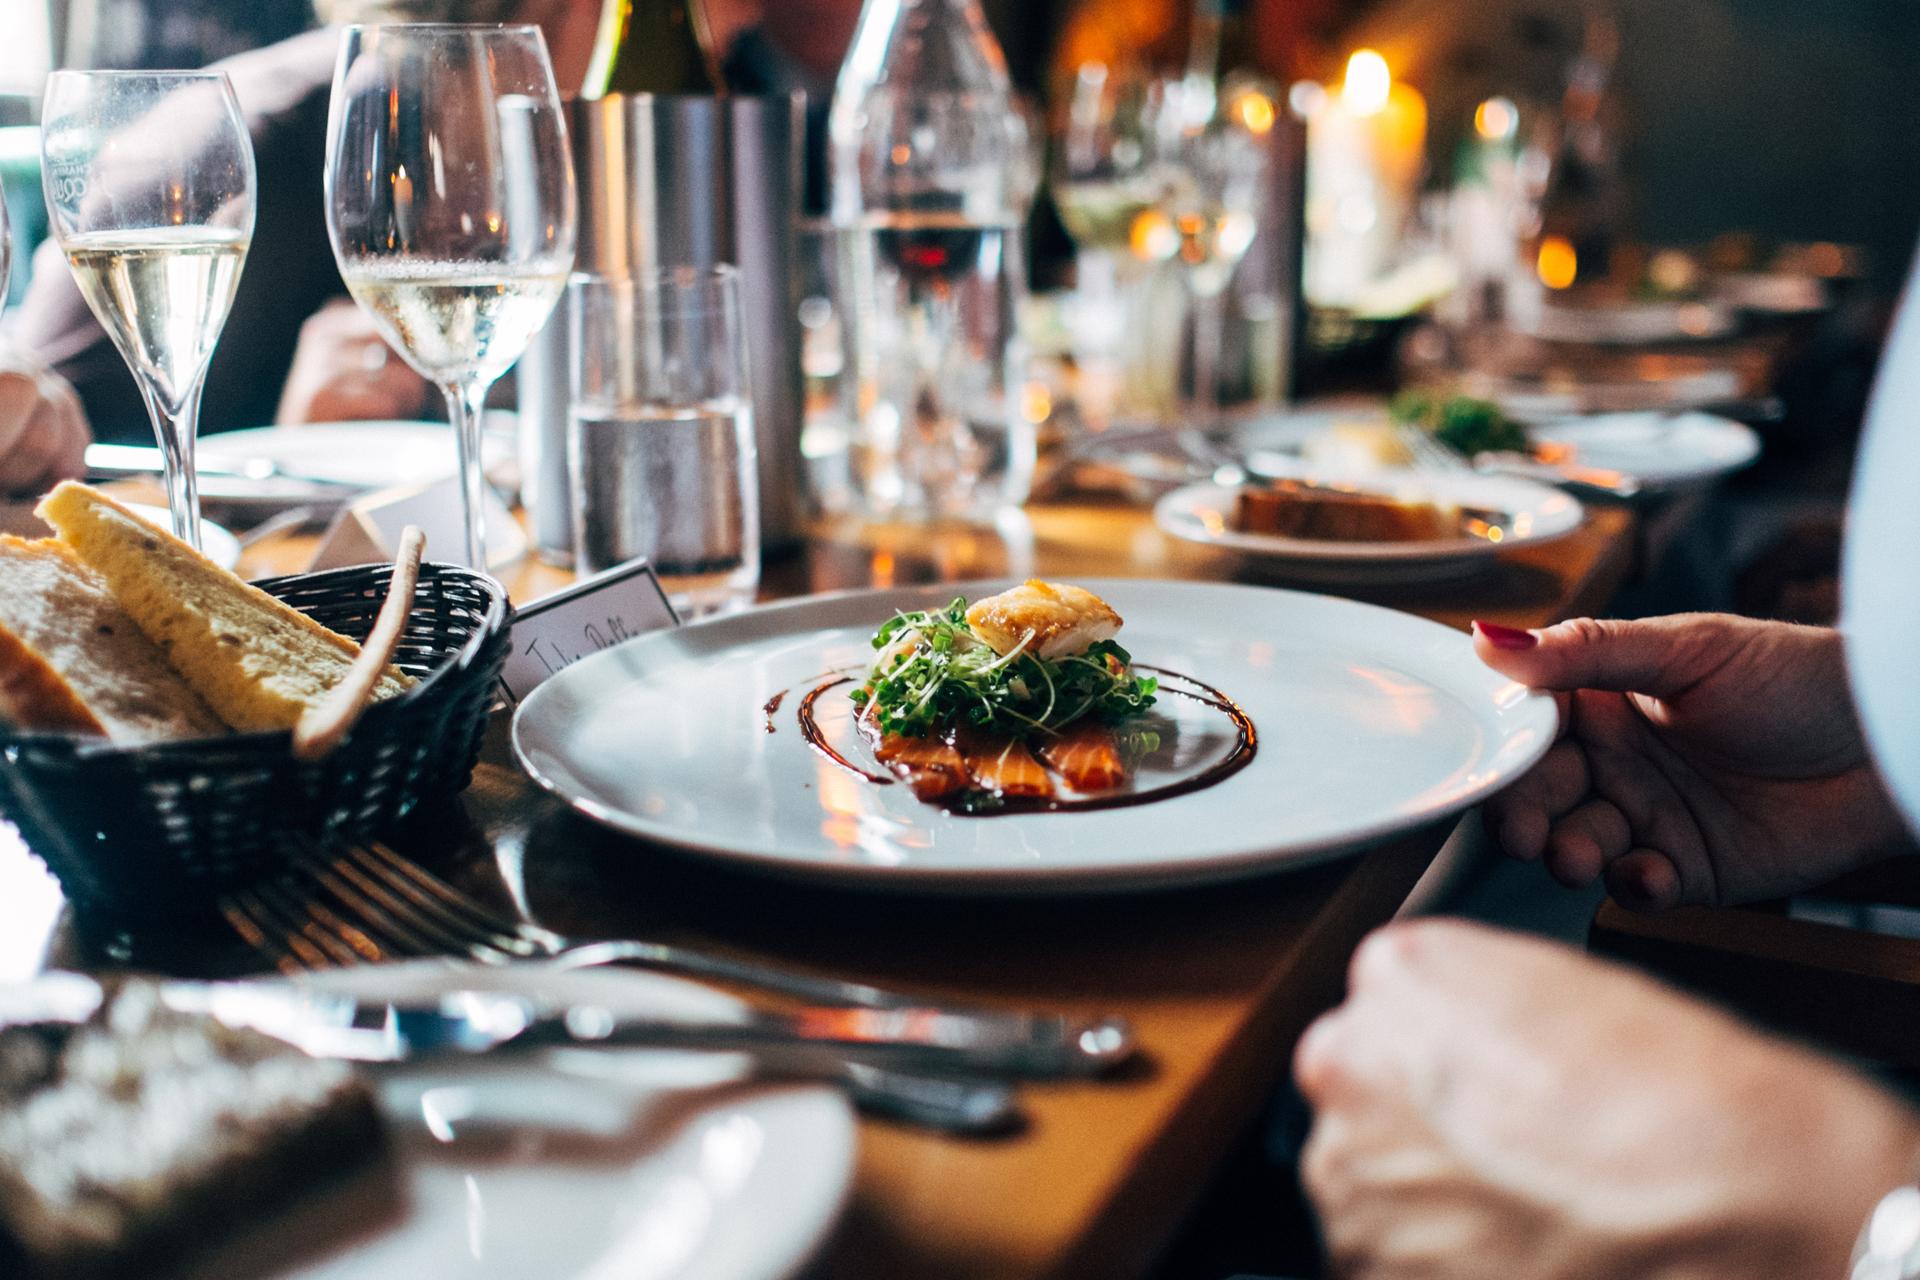 Dining at The Landmark Restaurant